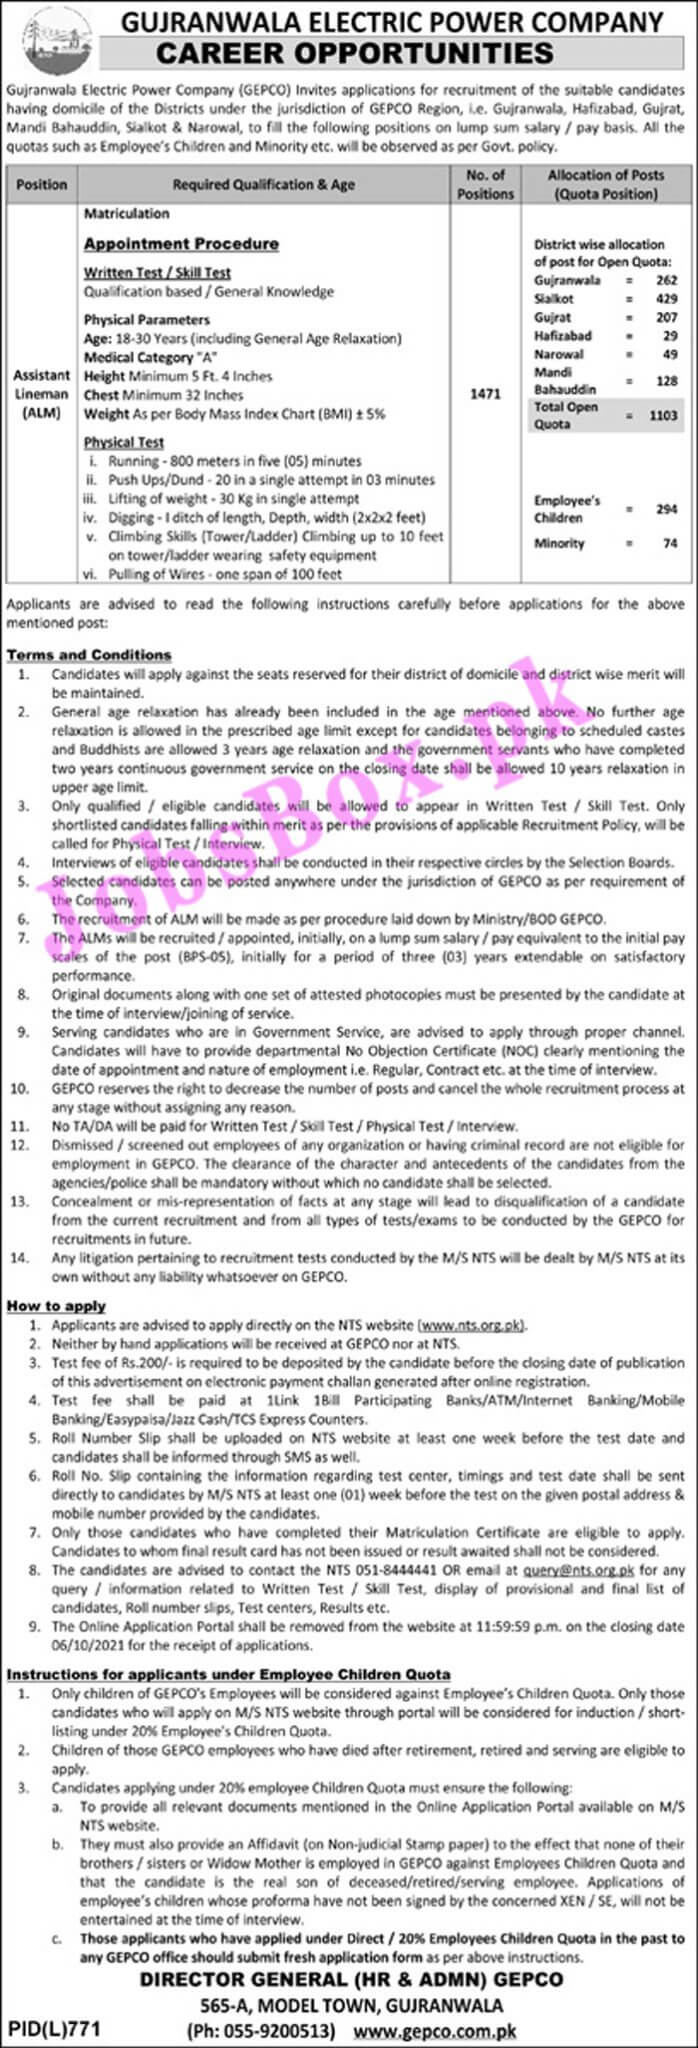 GEPCO Jobs 2021 - Gujranwala Electric Power Company GEPCO Jobs 2021 in Pakistan - WAPDA Jobs 2021